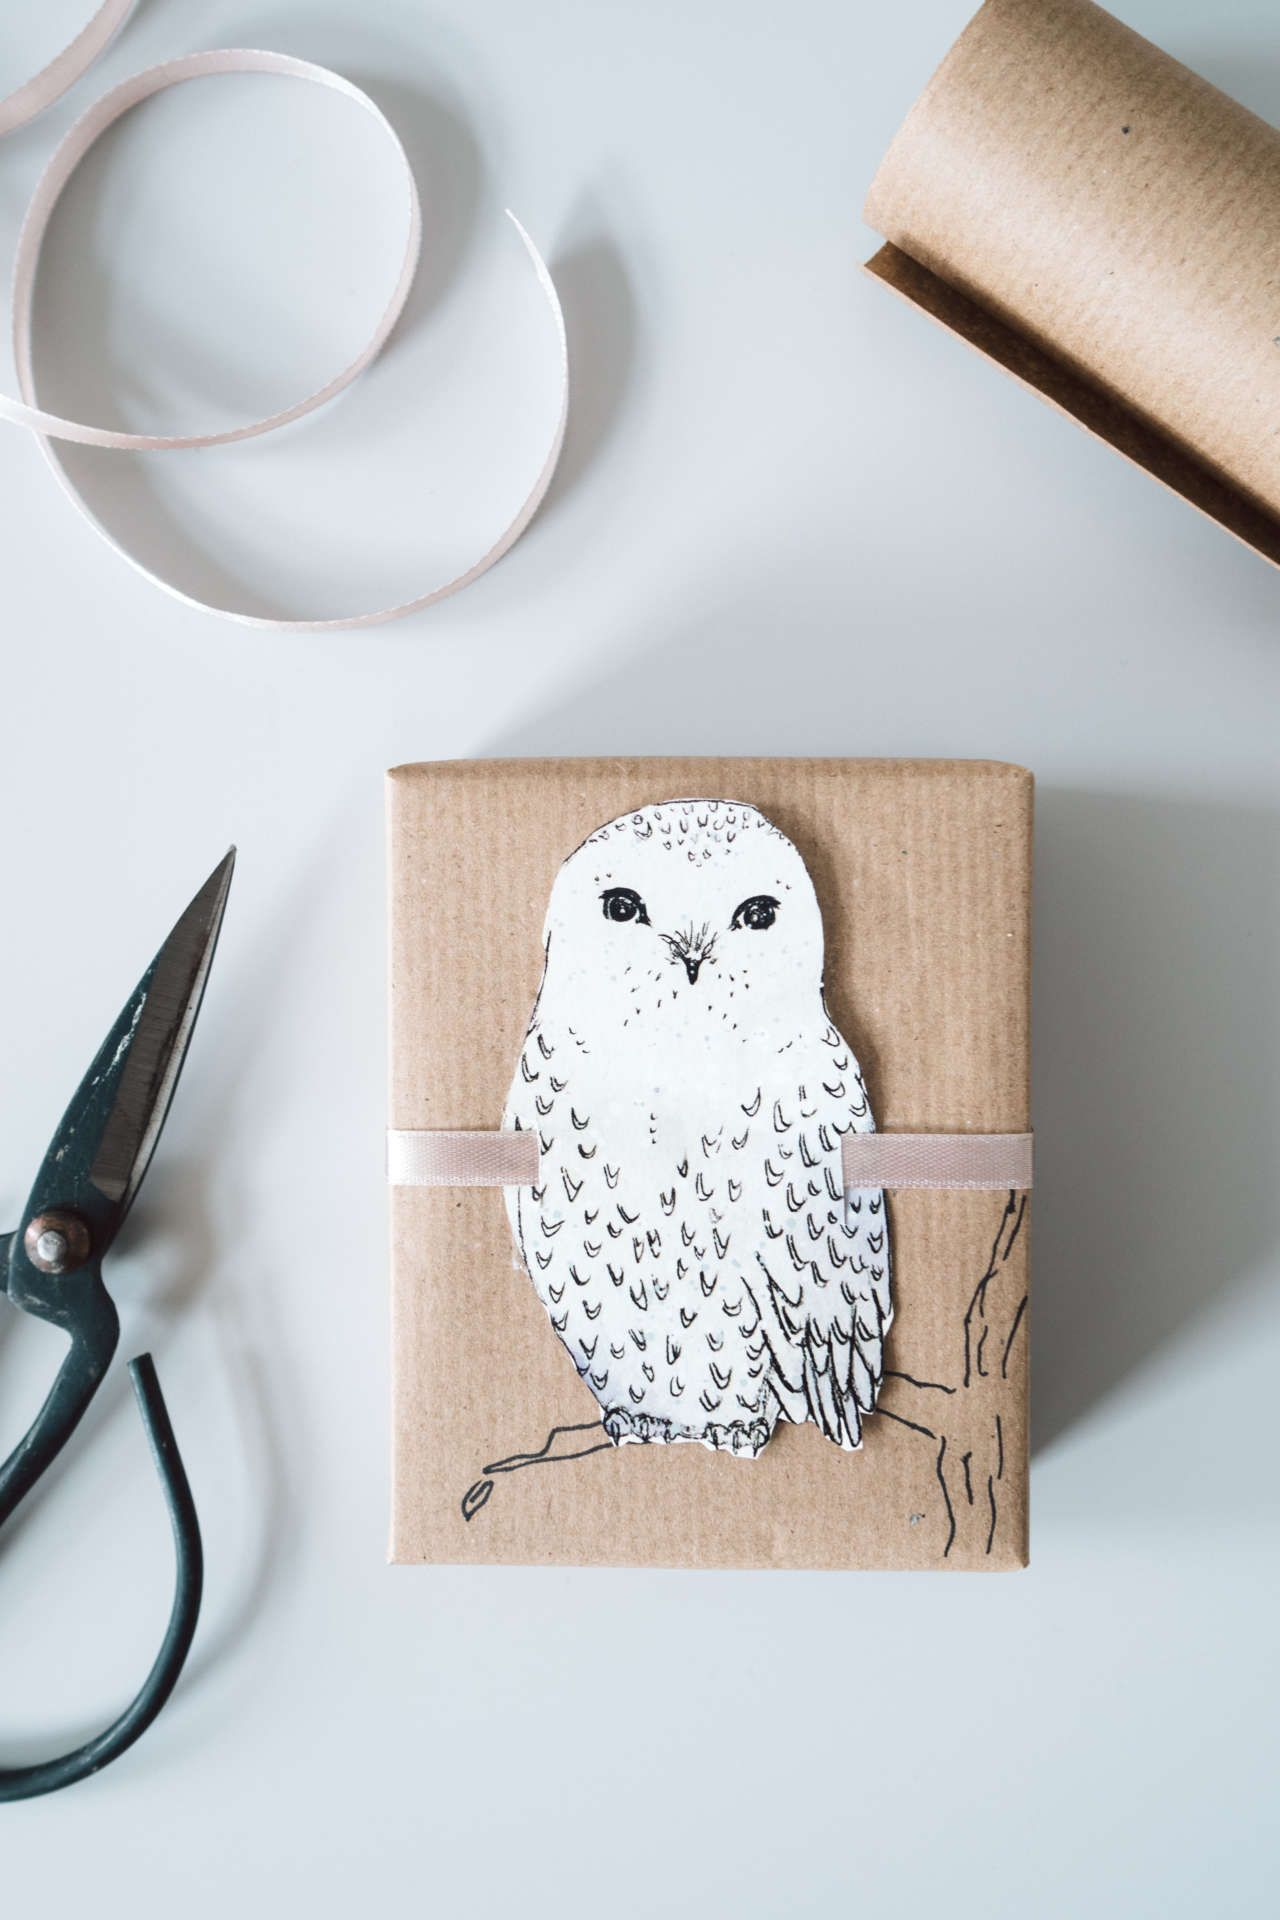 Geschenke verpacken: Niedliche Wintertiere